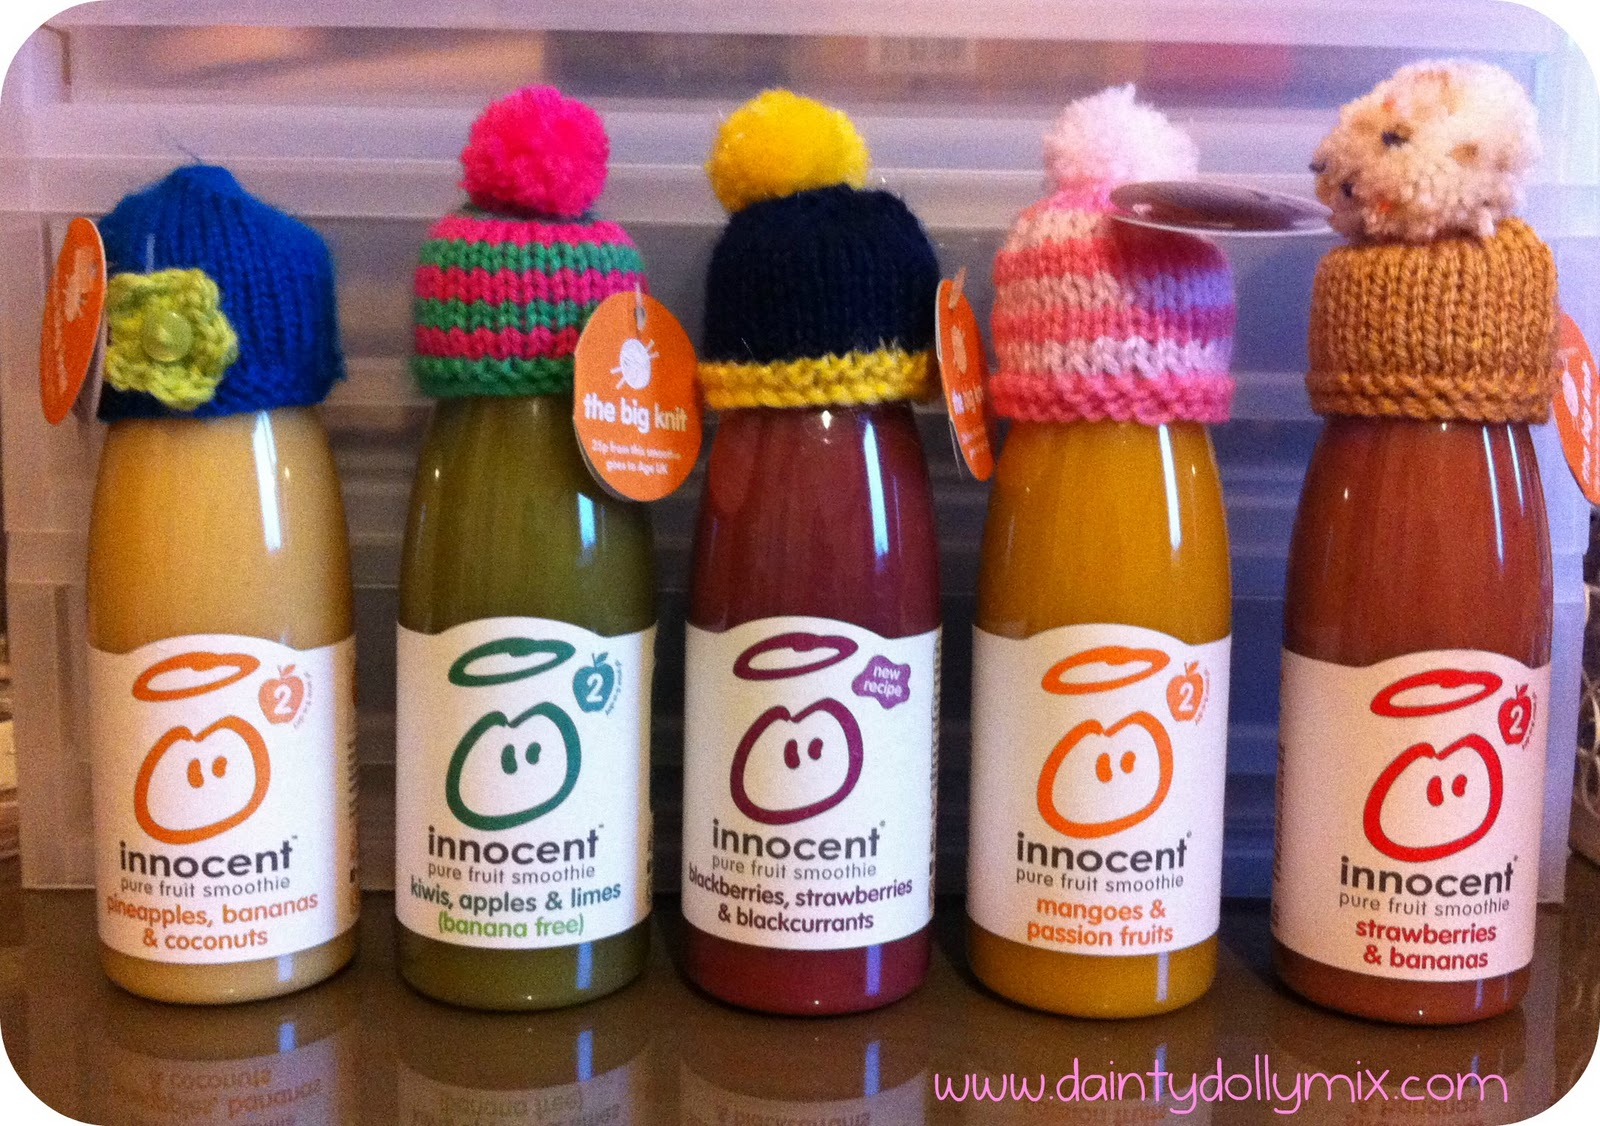 aa66ed06e Dainty Dollymix UK Beauty Blog: Innocent Smoothies & The Big Knit